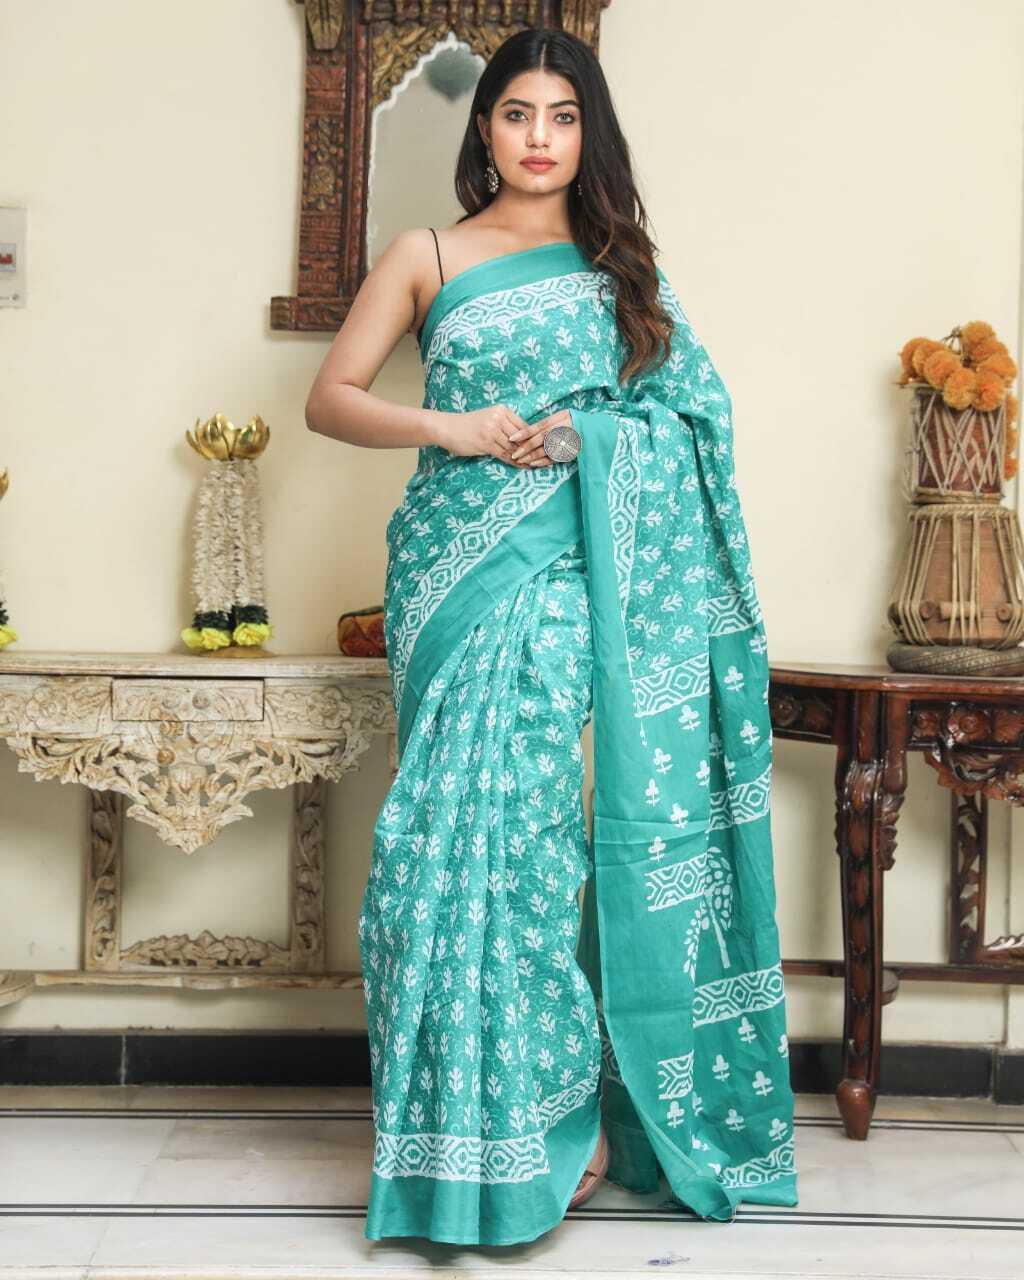 Jaipur Latest Designer Handblock Hand Printed Cotton Saree For Women With Blouse